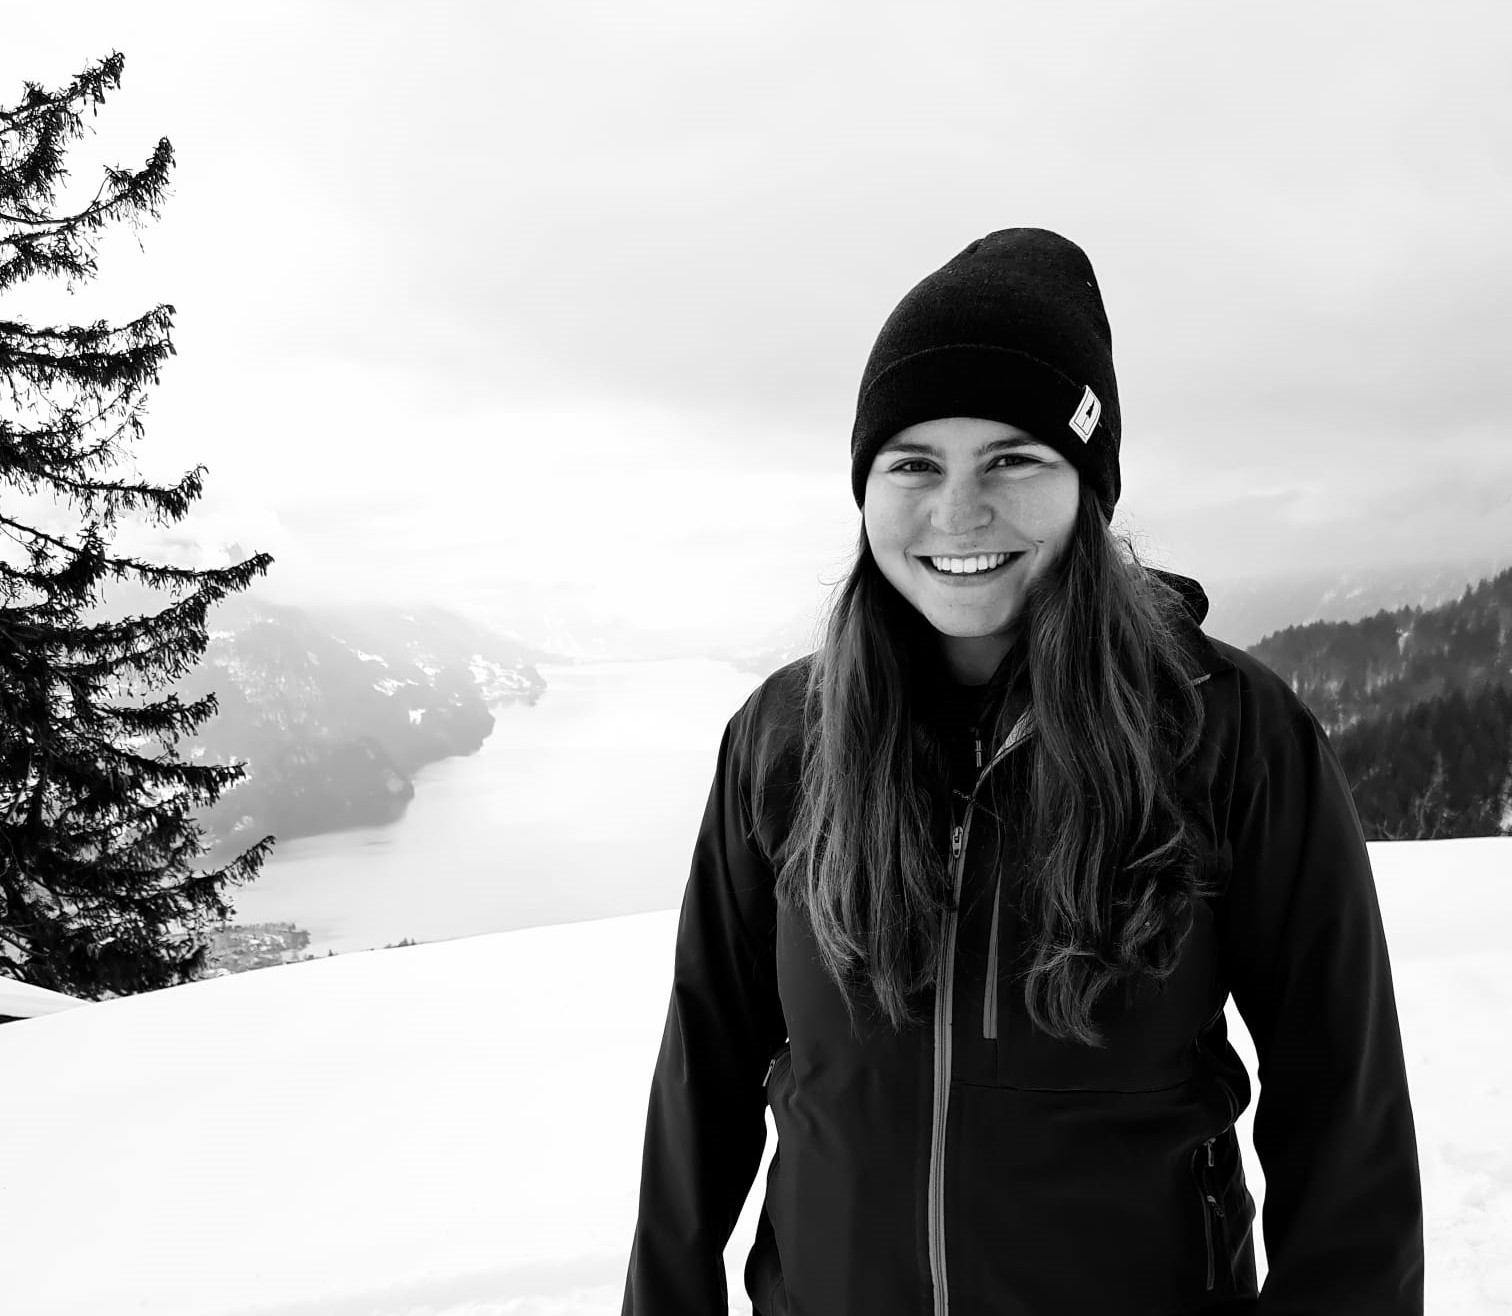 Elena Michel JO-Chefin, Homepageverwaltung, Skifahrerin